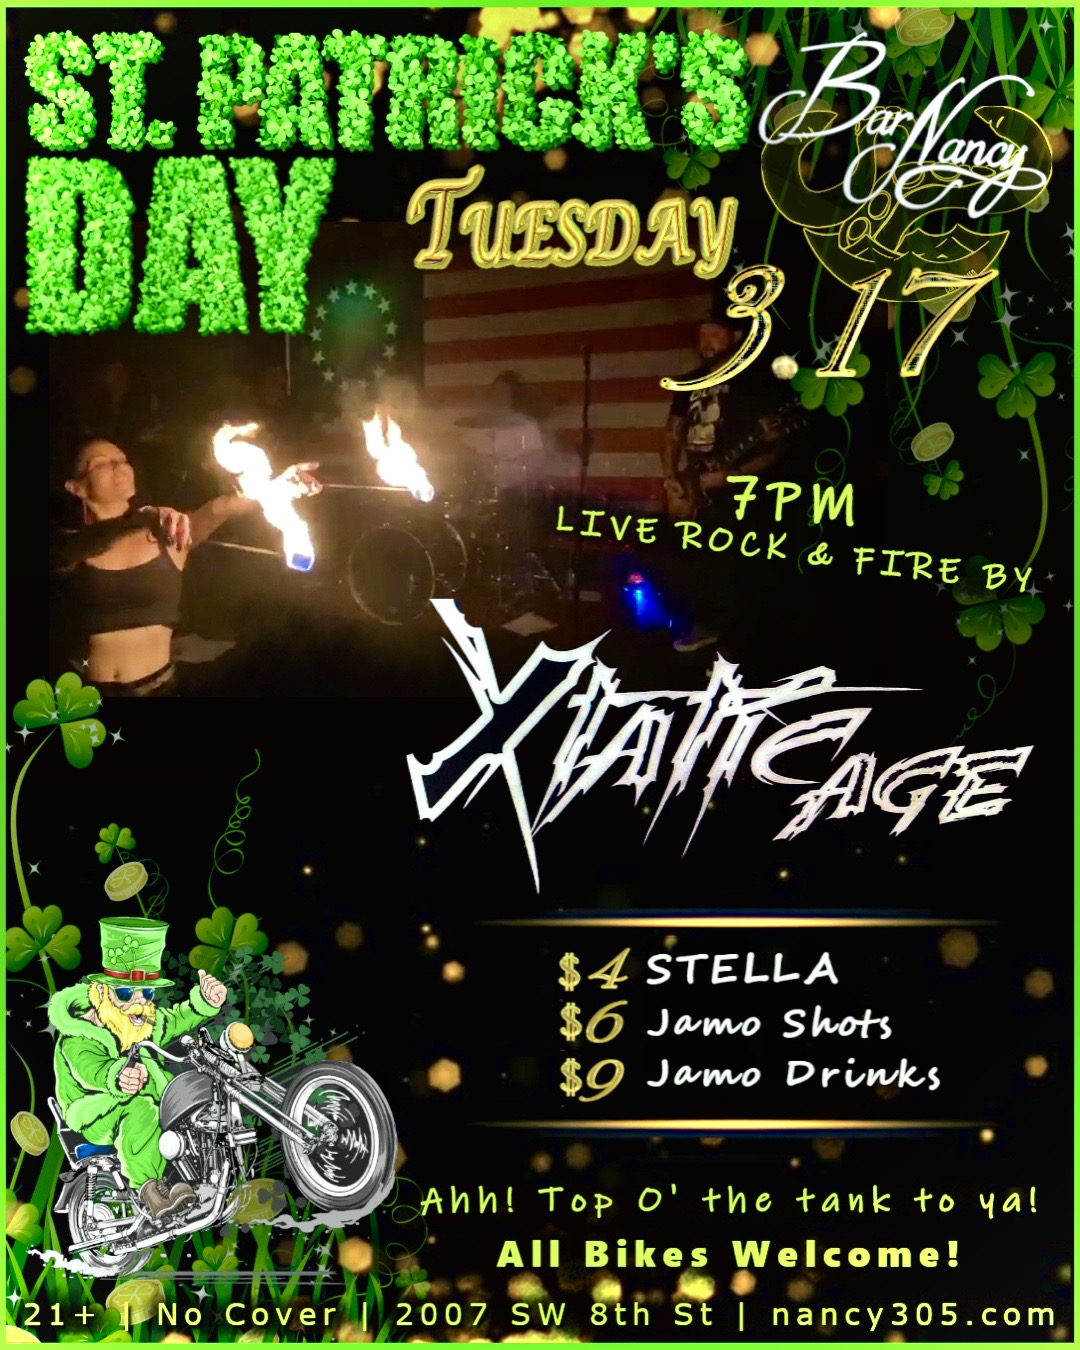 St. Patrick's Day Bike Nite! Live Rock & Fire By: Xtatic Age! at Bar Nancy